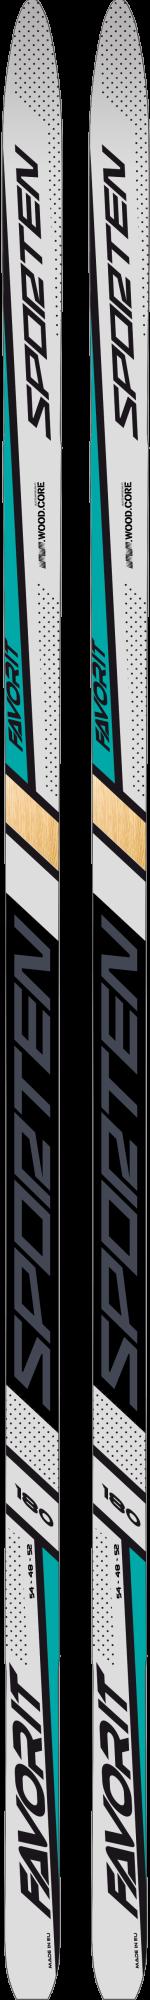 Sporten Favorit 54 MGE.png